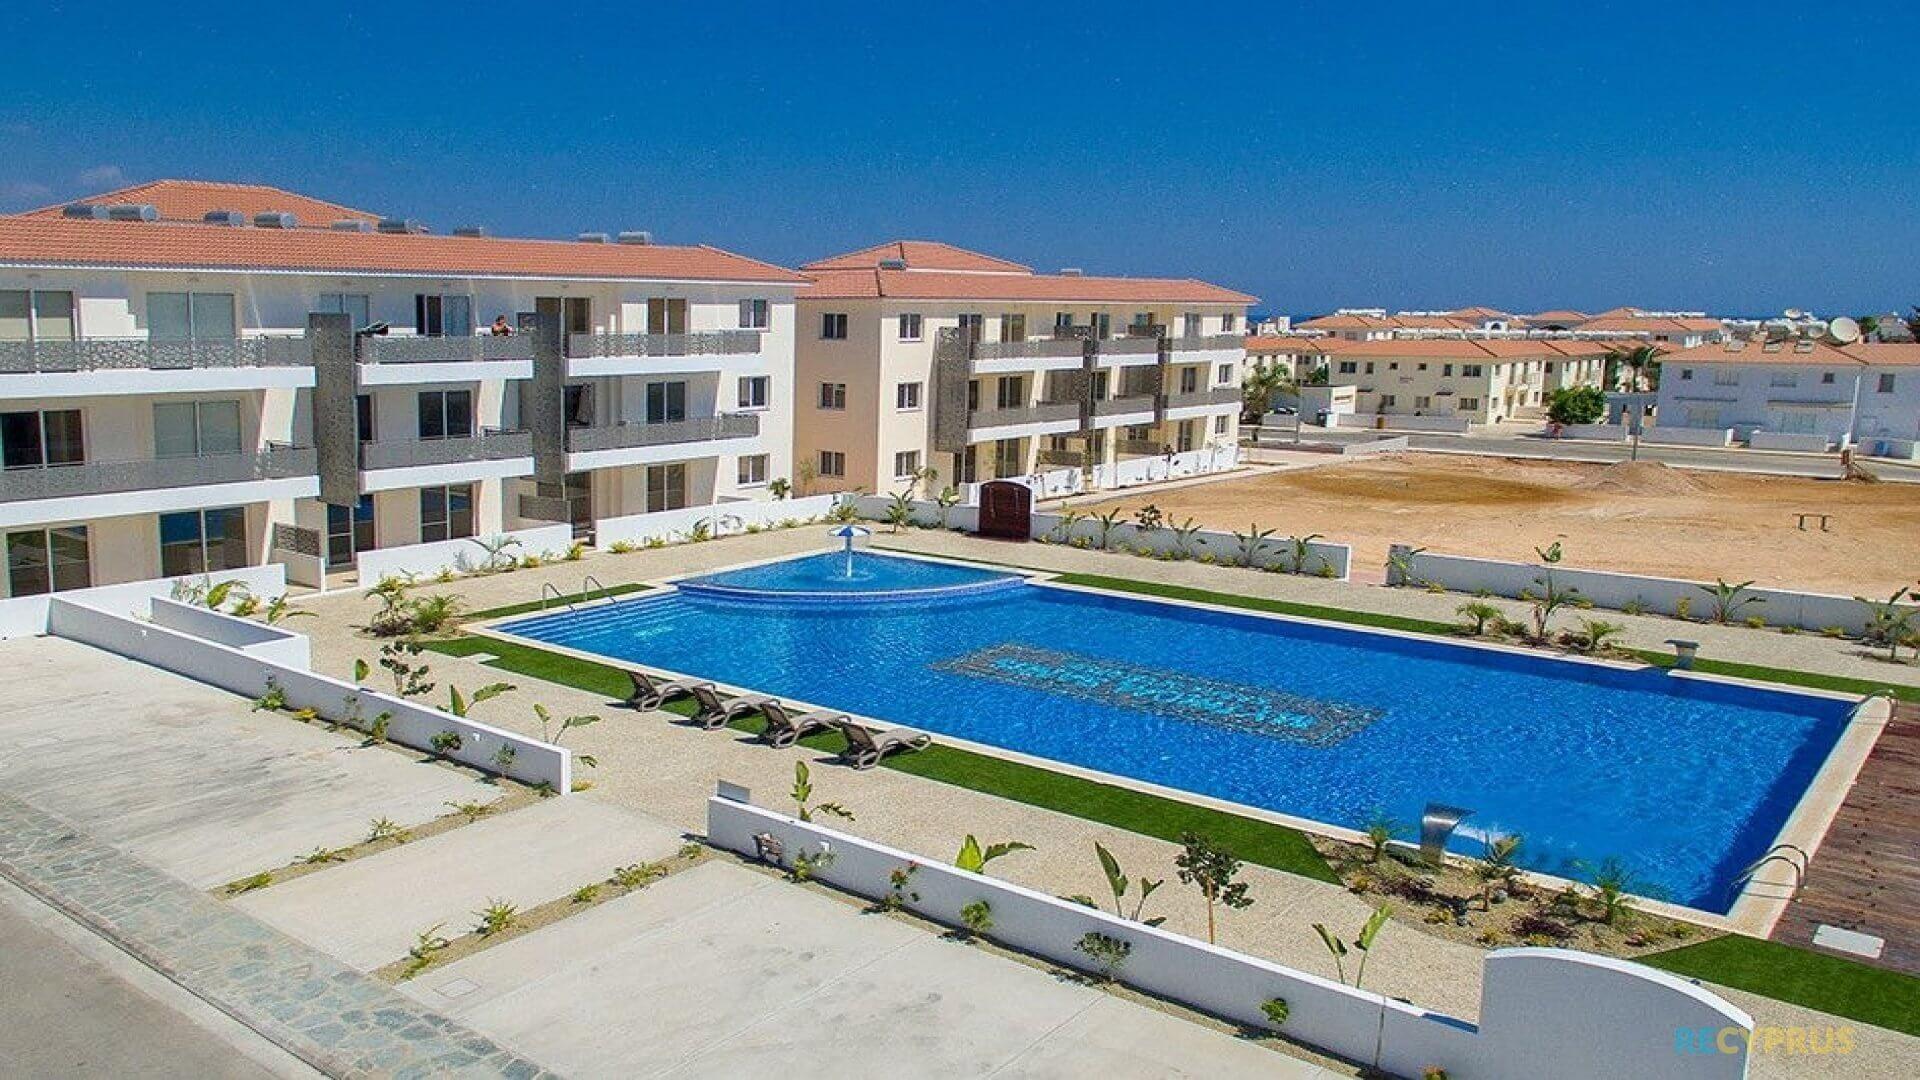 Apartment for sale Kapparis Famagusta Cyprus 2 3516